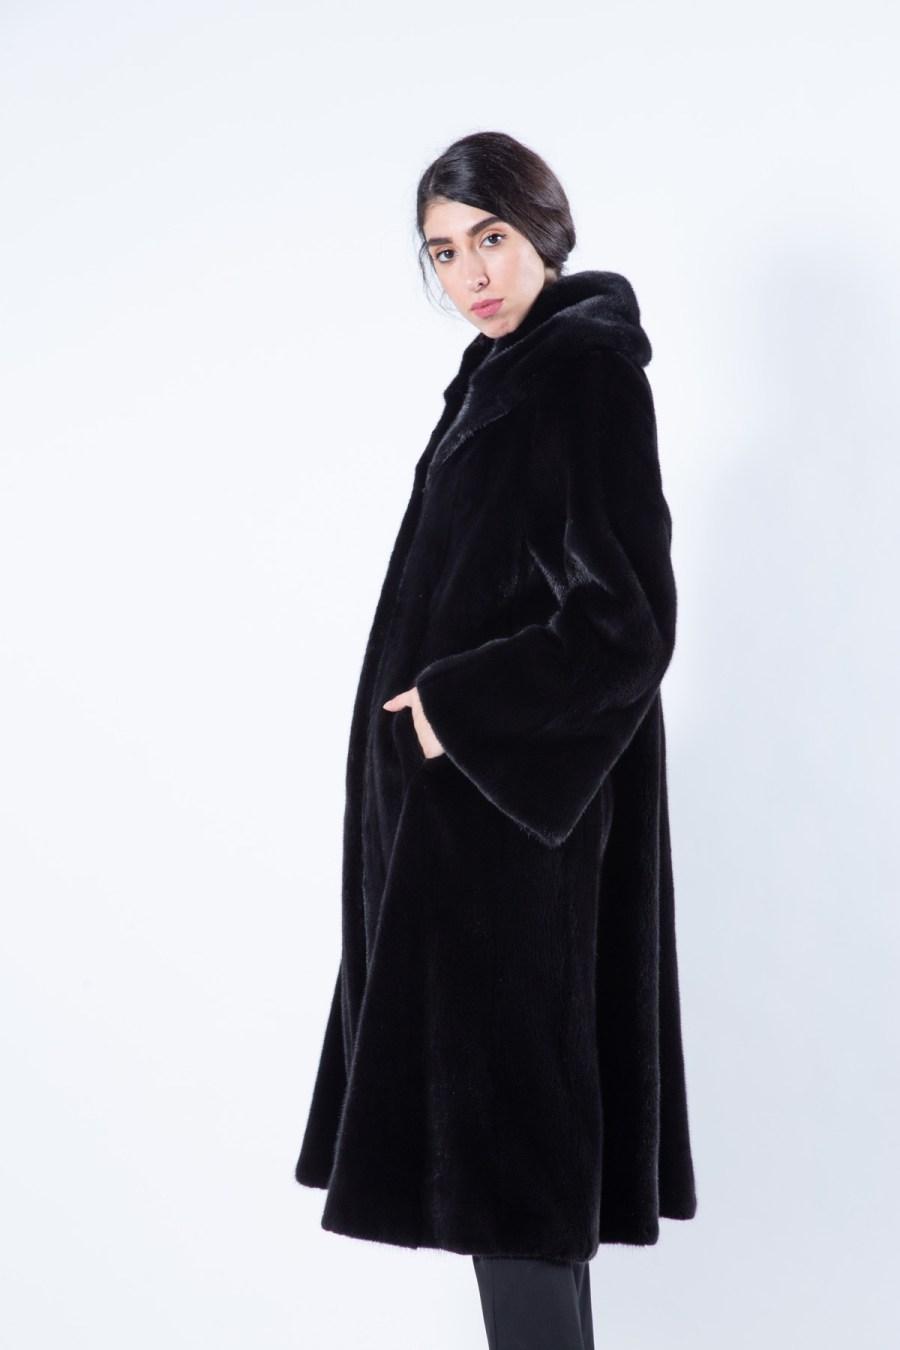 Blackglama Mink Coat with collar - Sarigianni Furs